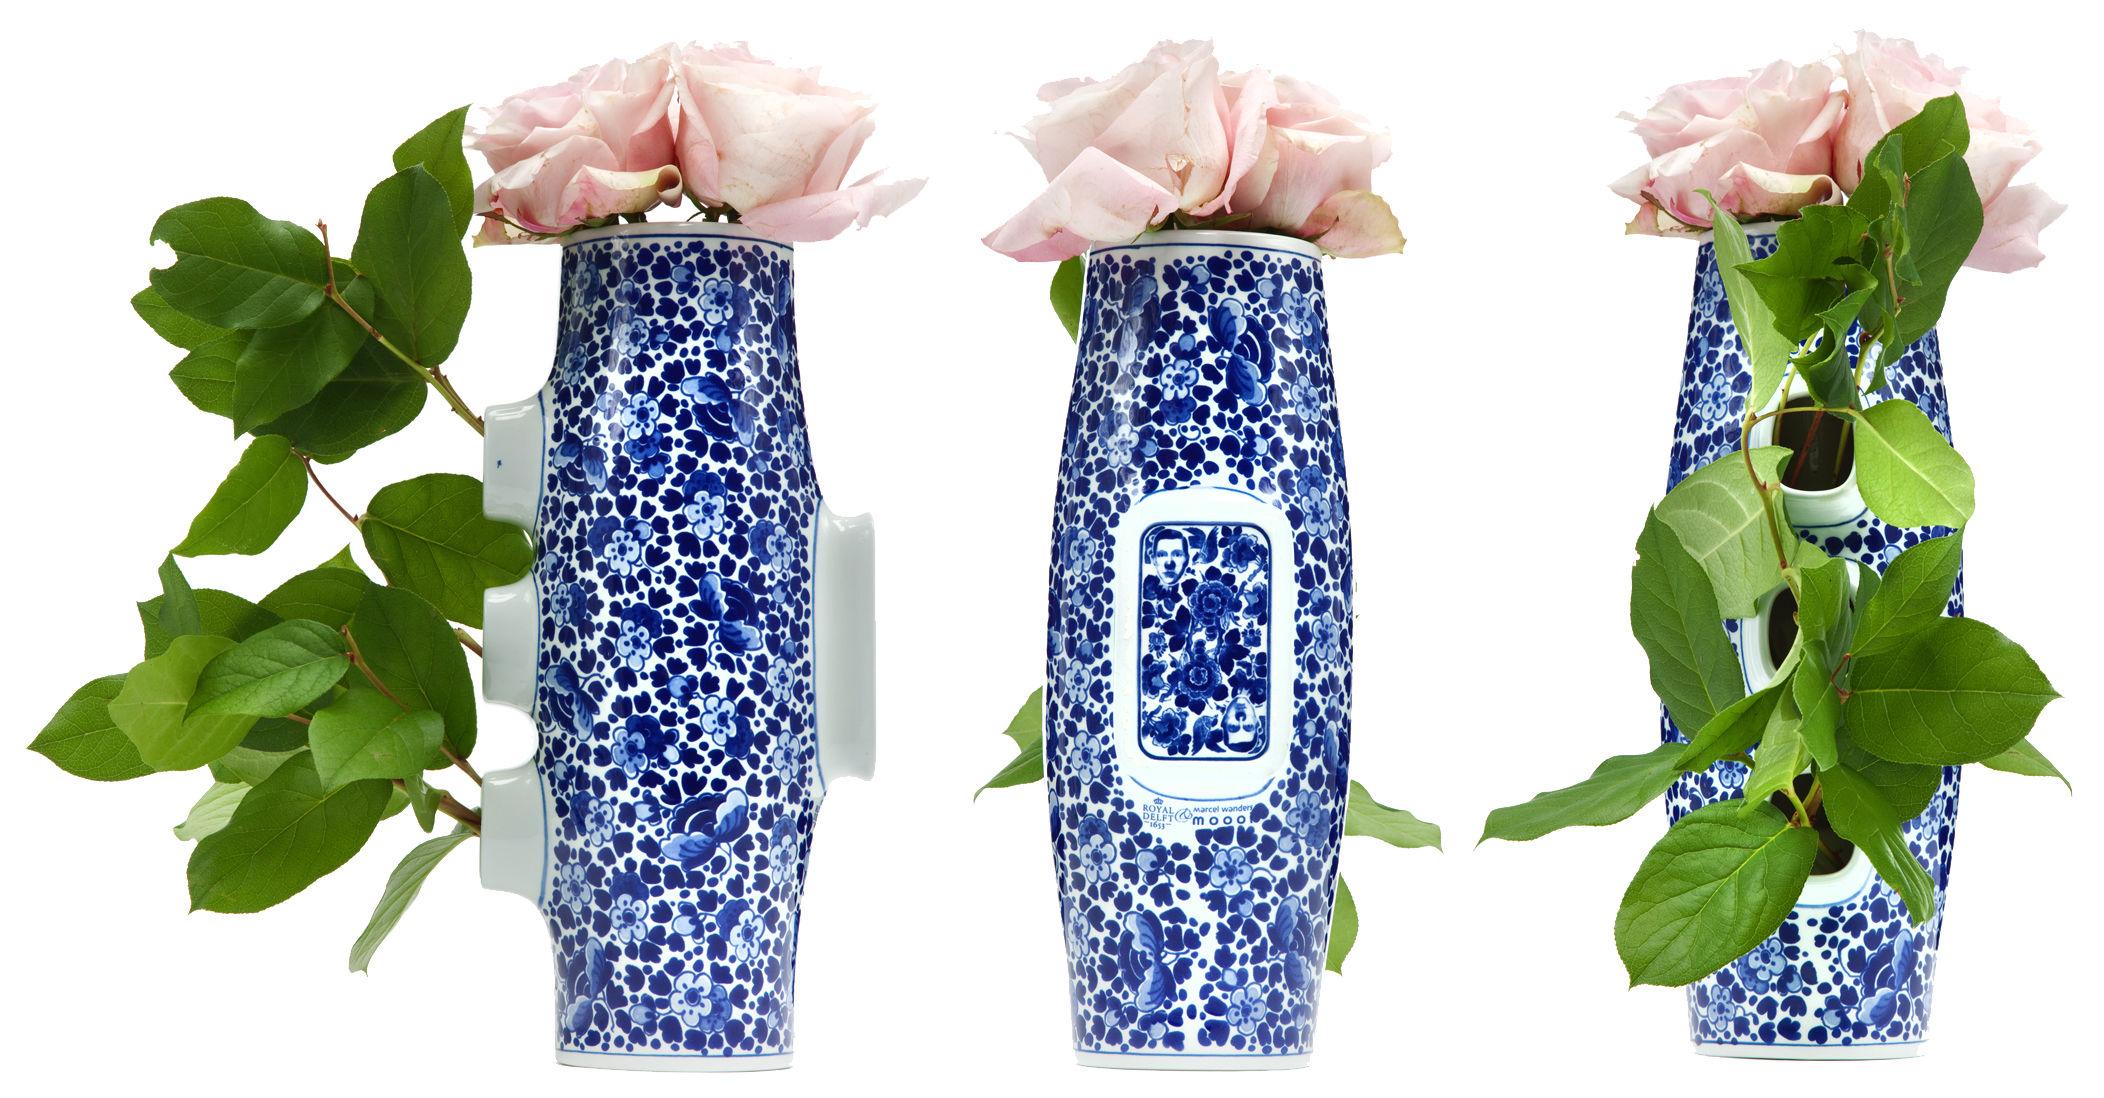 Decoration - Vases - Delft Blue 4 Vase by Moooi - White & blue - China